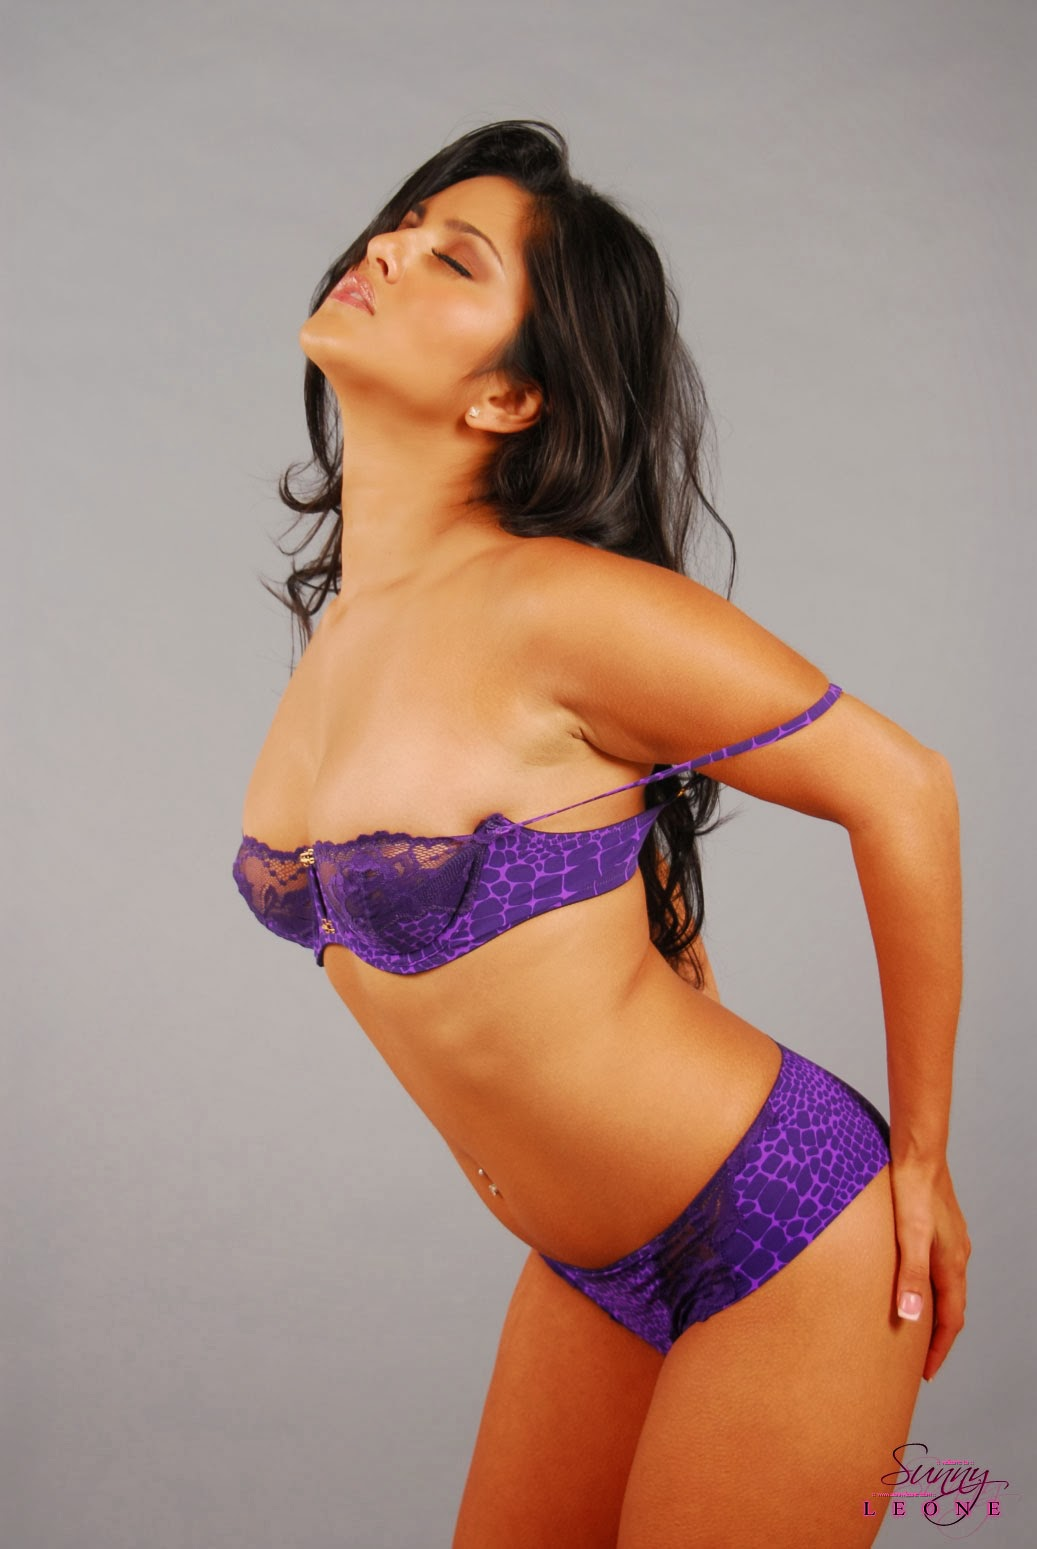 22 purple saree bhabhi sucking cock like pro - 5 10